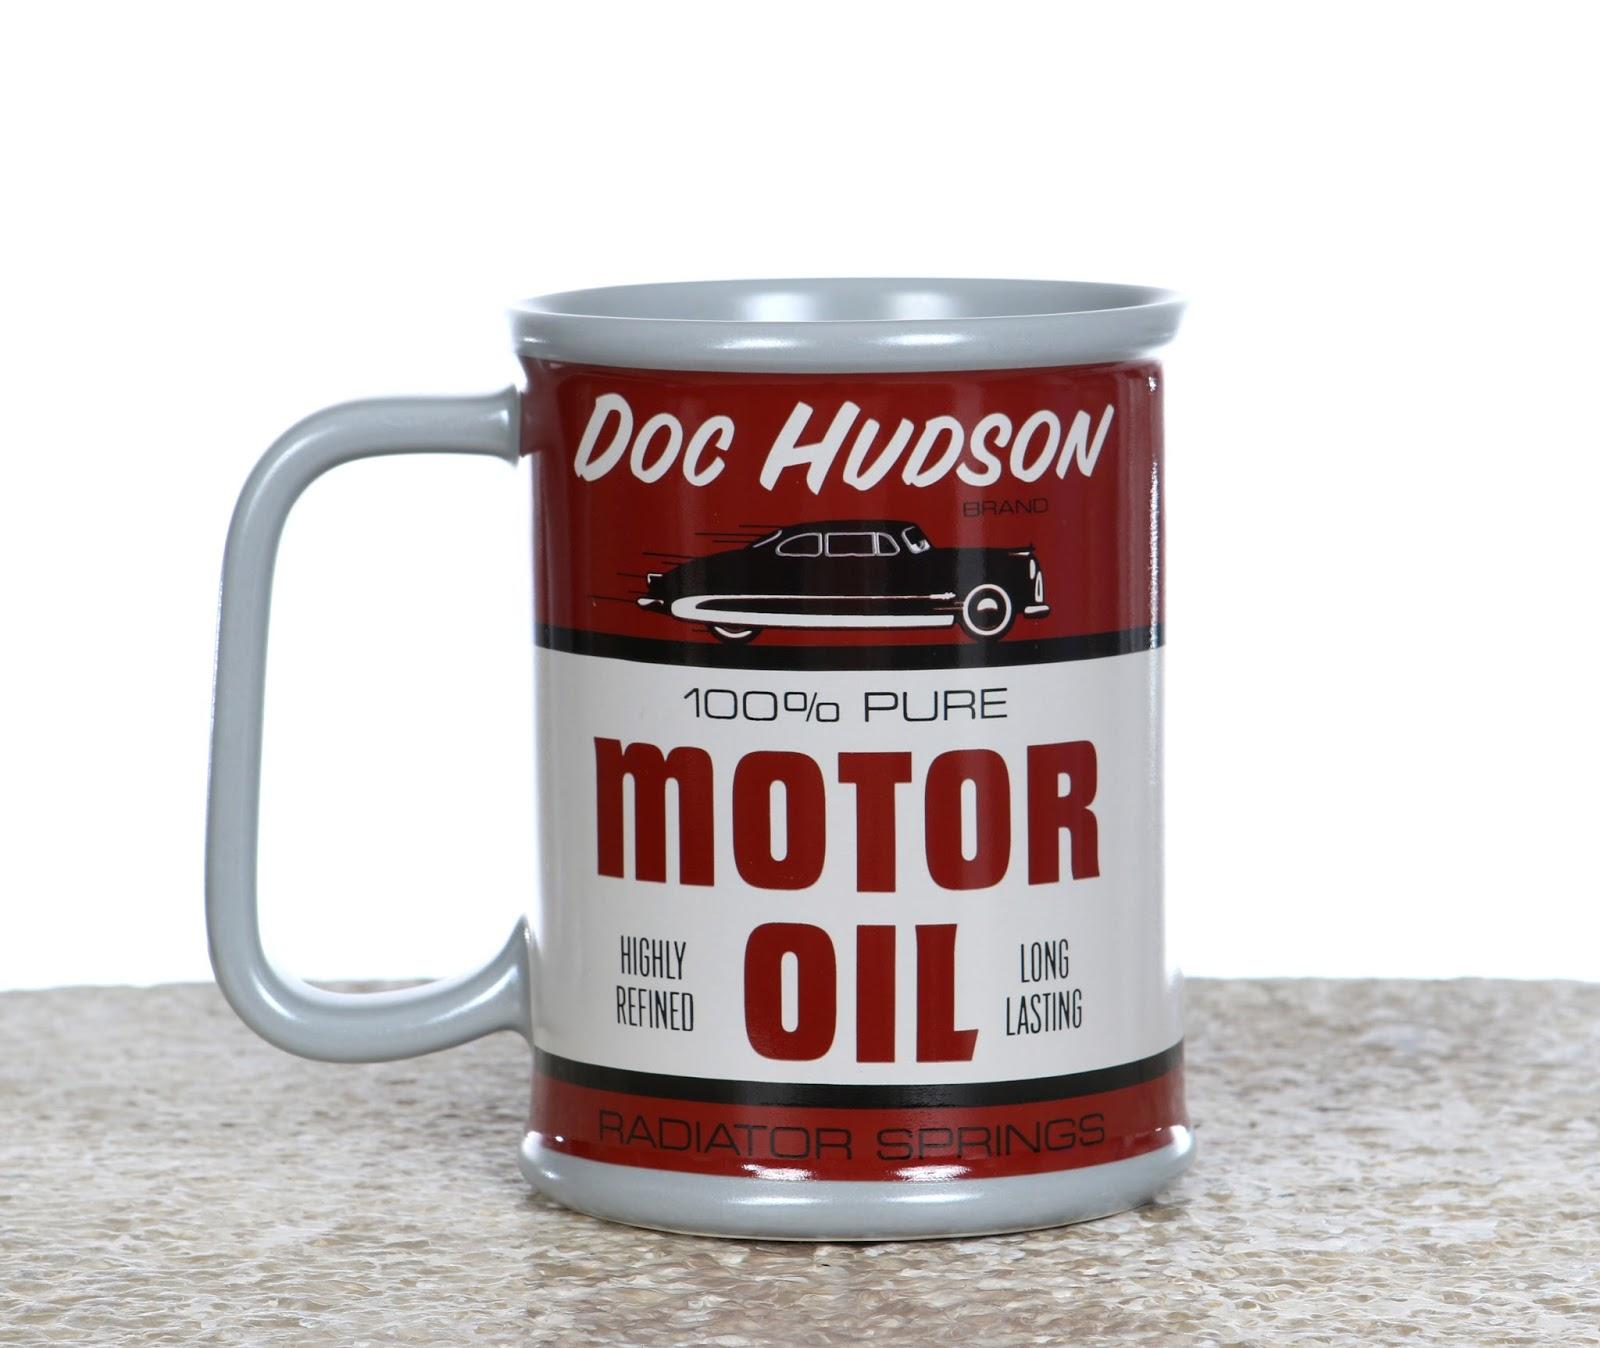 Cars 3 Disney Store Doc Hudson Motor Oil Mug